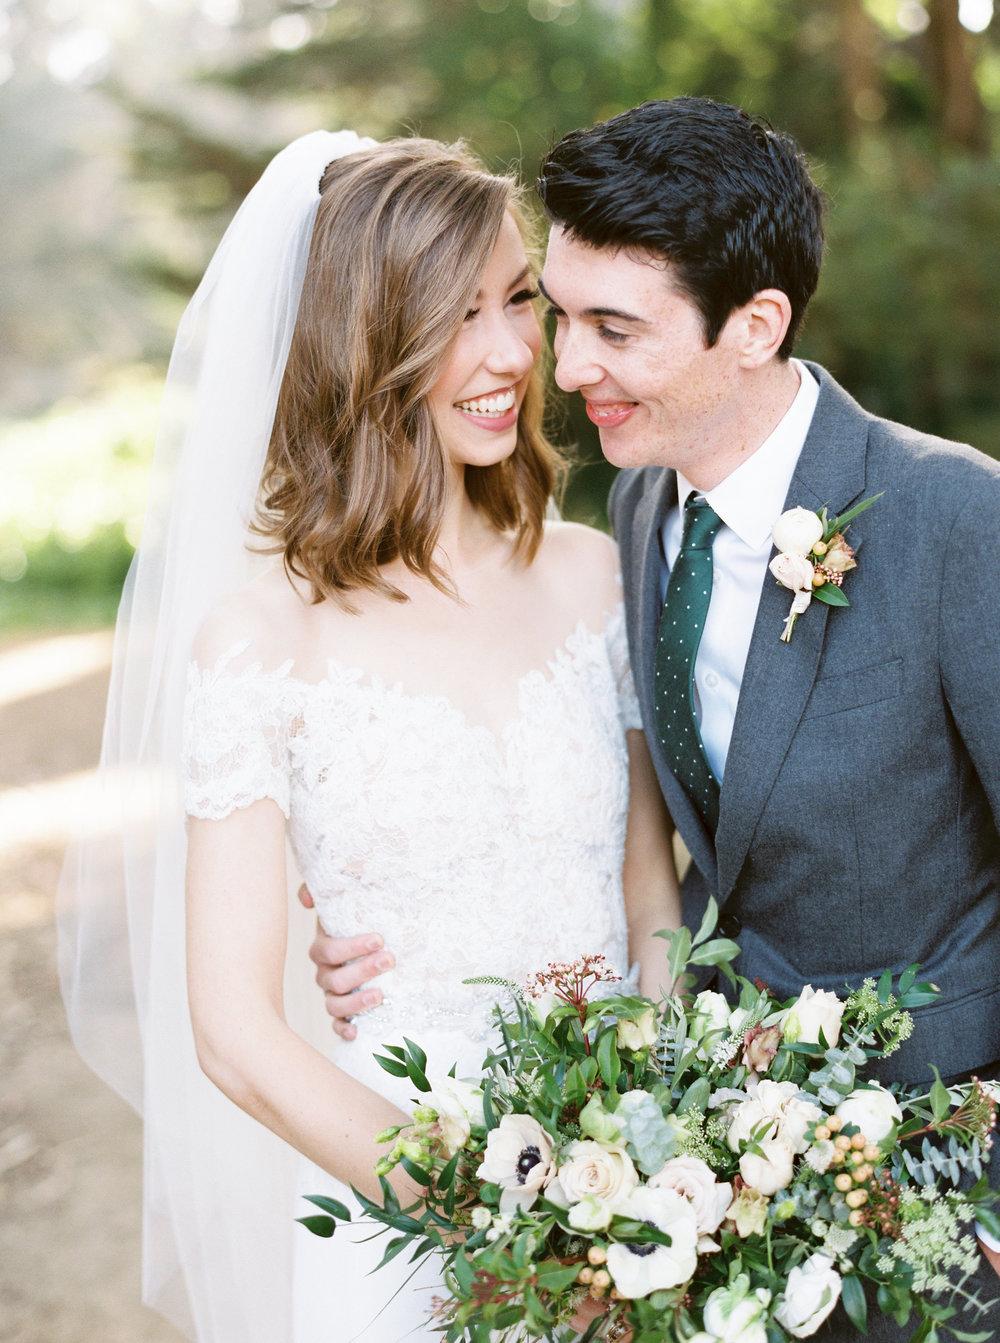 Log-cabin-wedding-in-presidio-san-francisco-california-desintation-wedding-photography-56.jpg